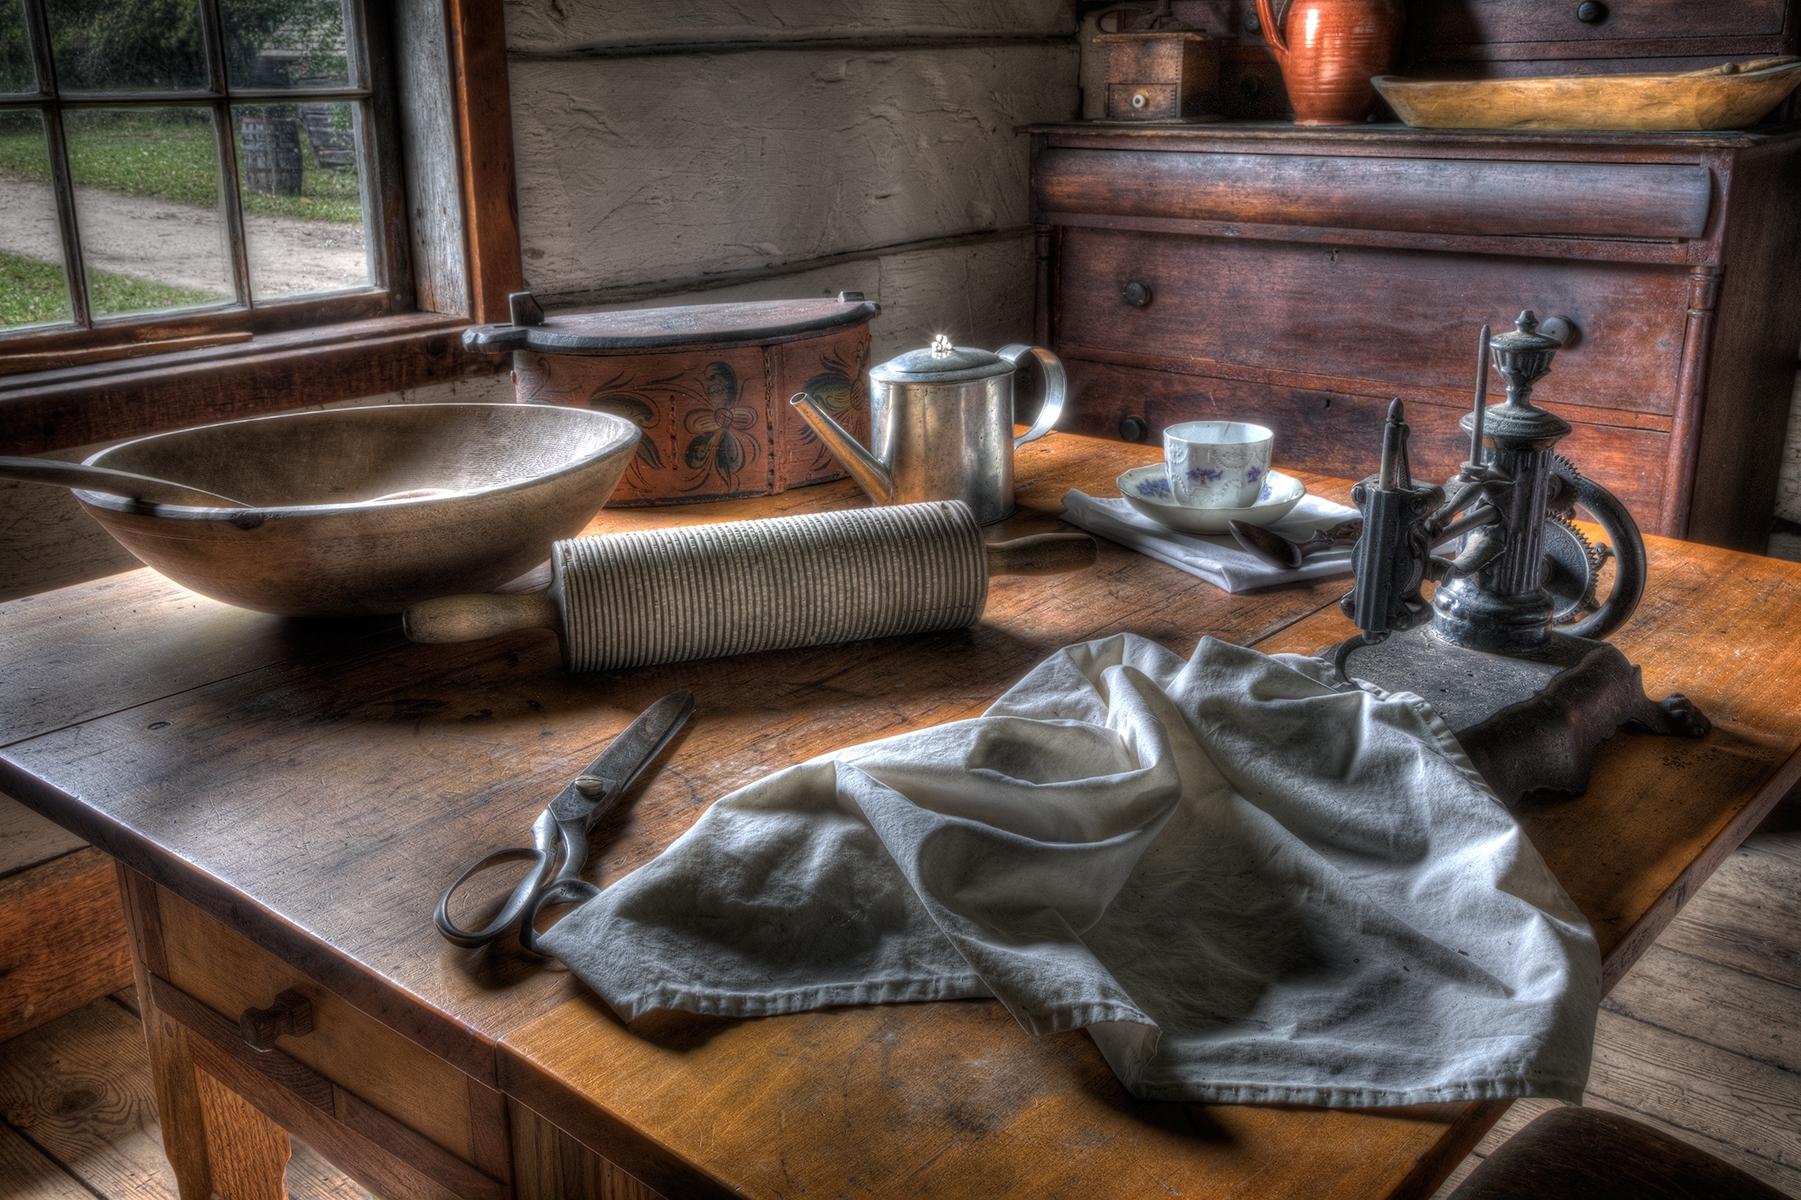 Kitchen-Table-PM-1-Place-by-Michael-Fredrich-LV